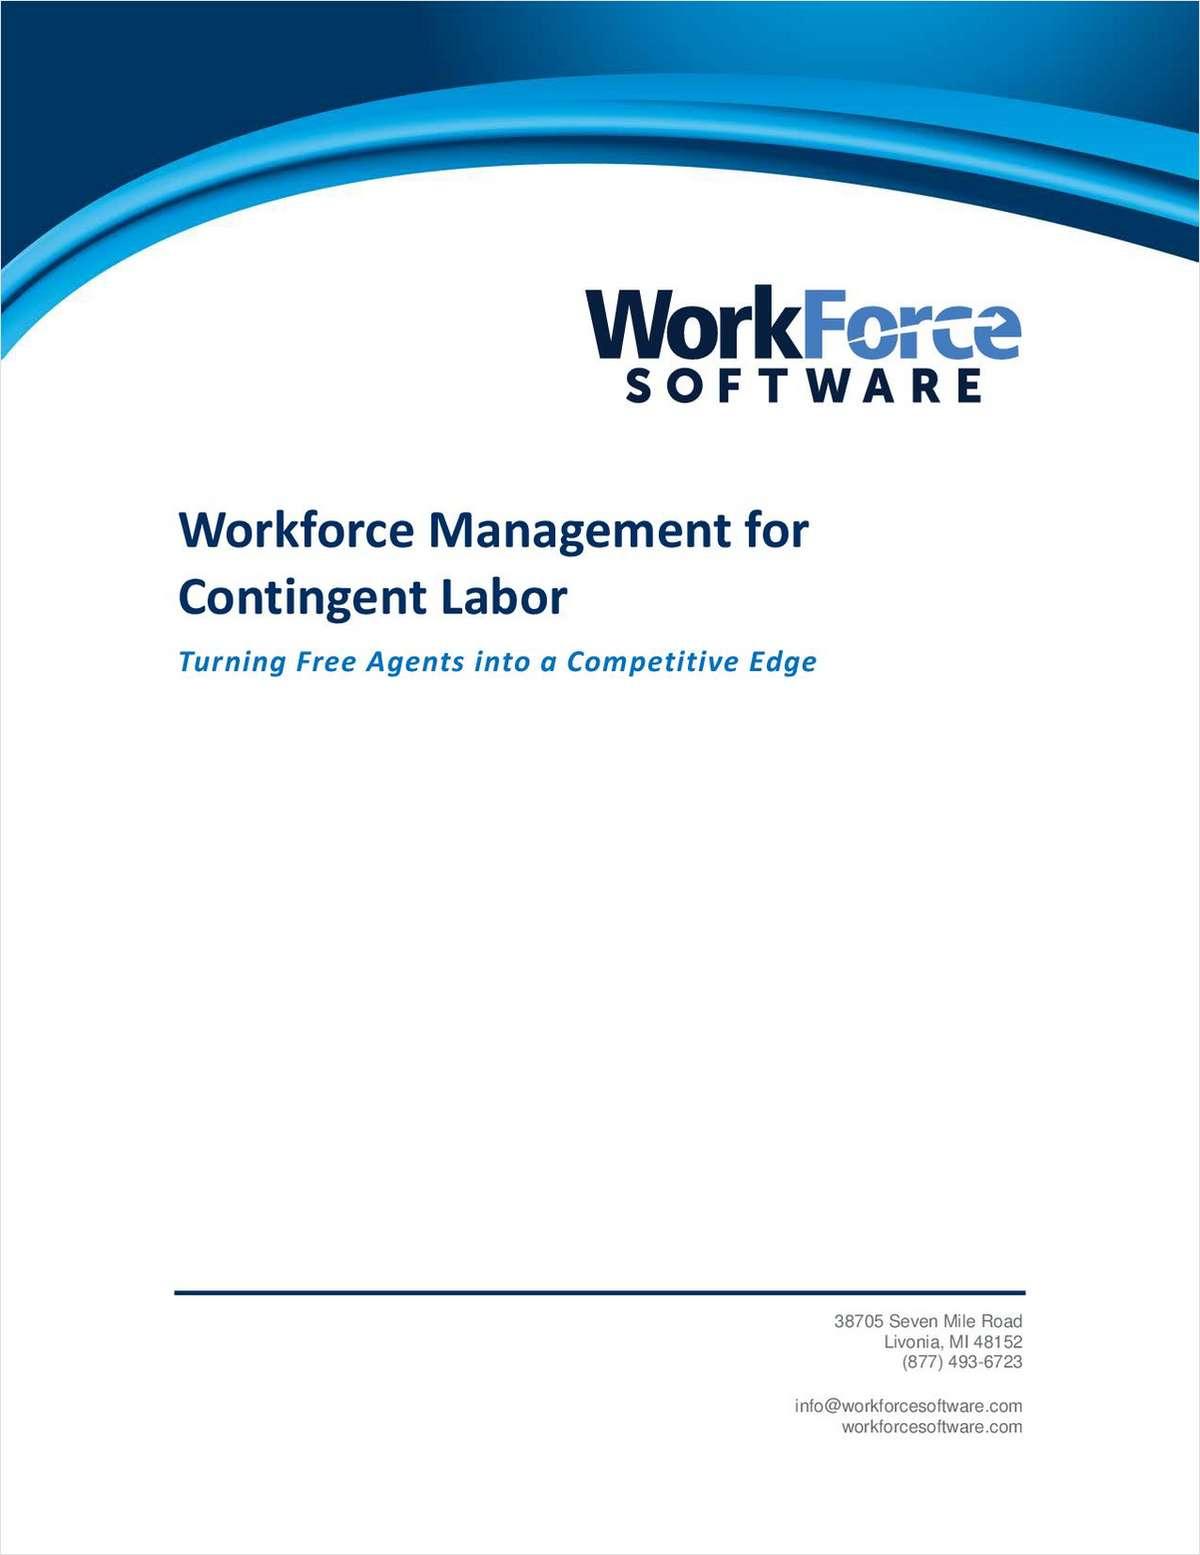 Workforce Management for Contingent Labor